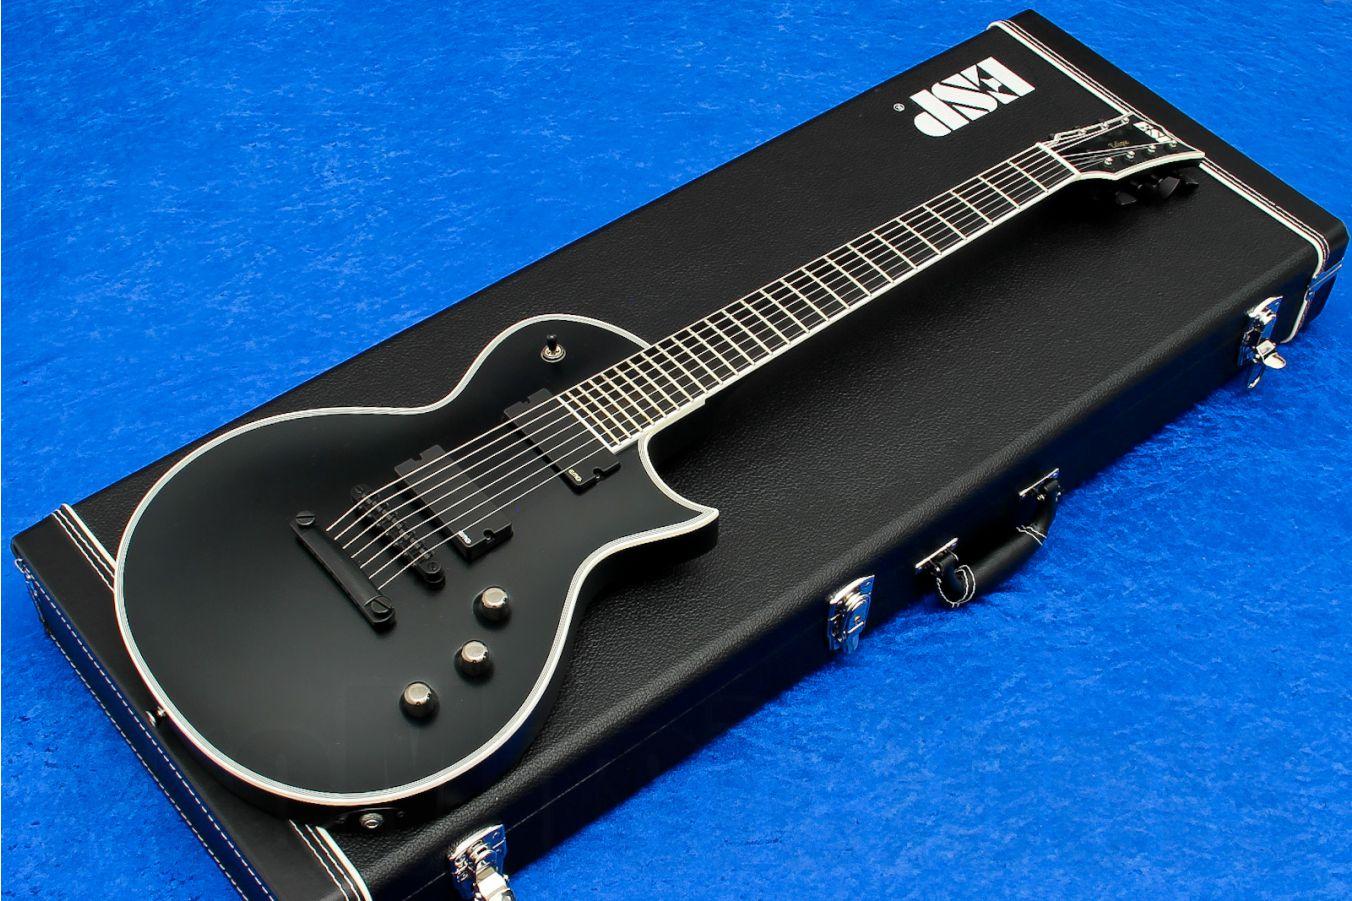 ESP Eclipse 24-7 USA BLKS - Black Satin